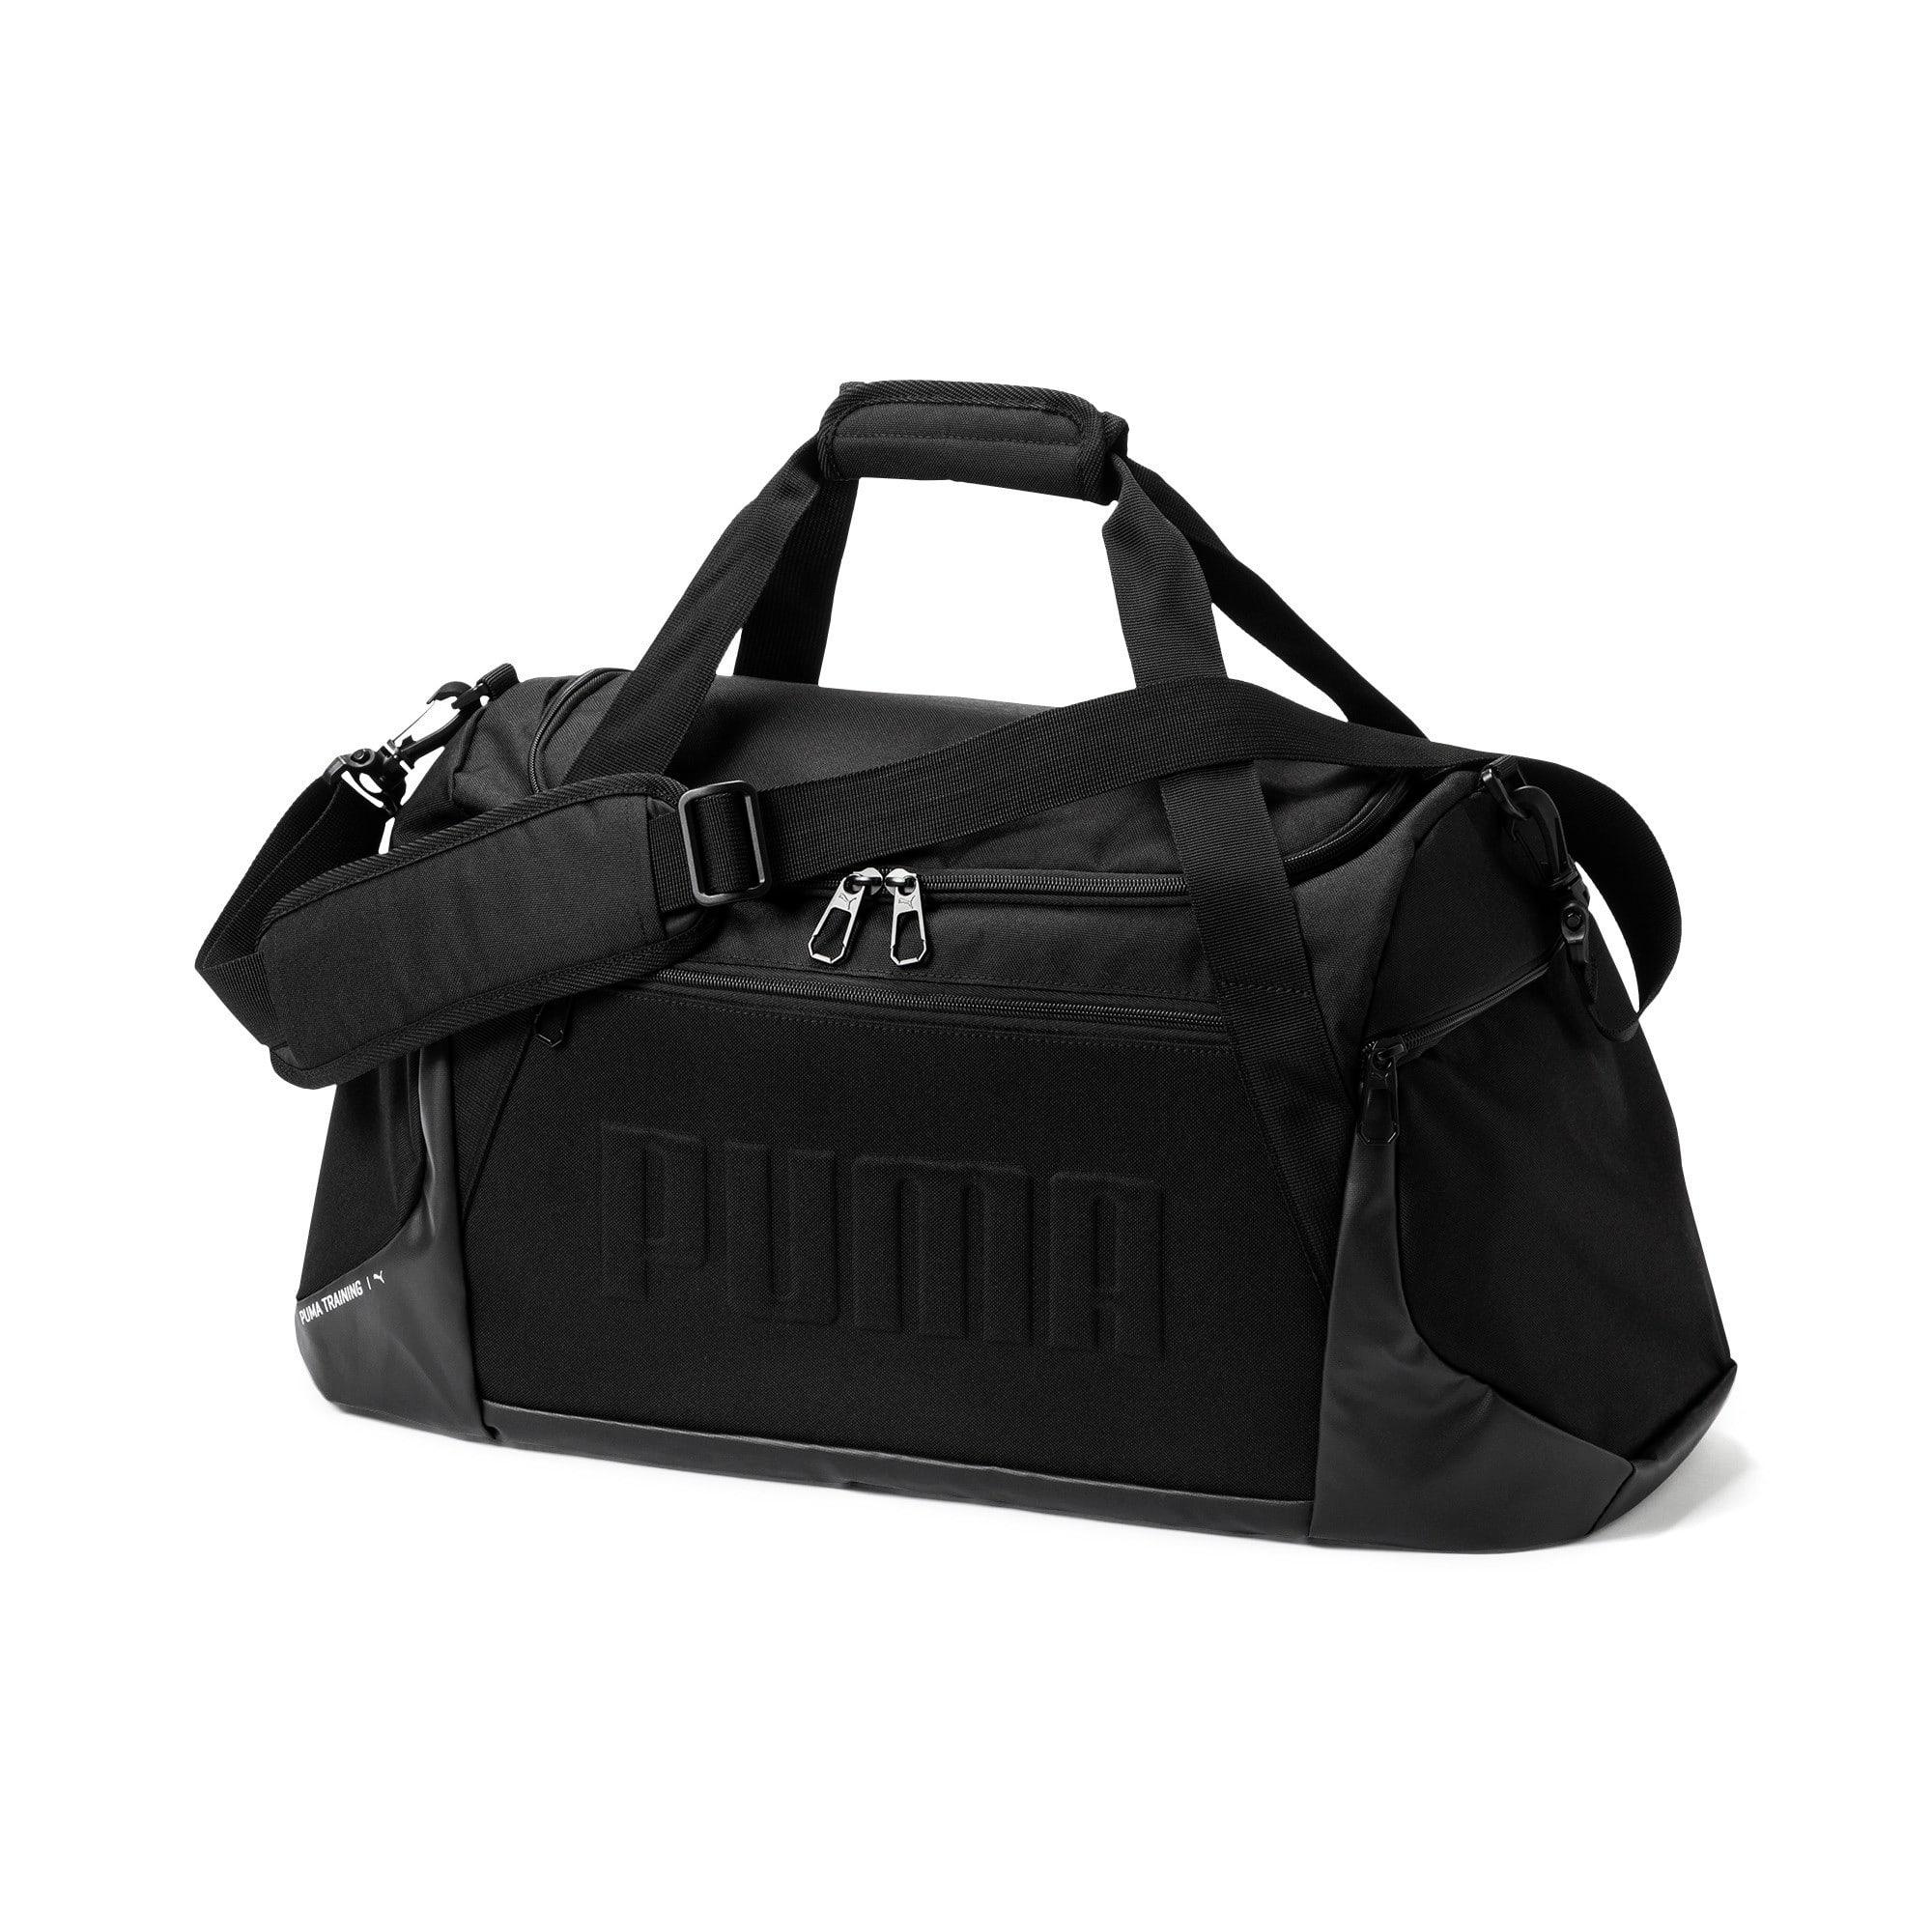 Thumbnail 1 of GYM Medium Duffle Bag, Puma Black, medium